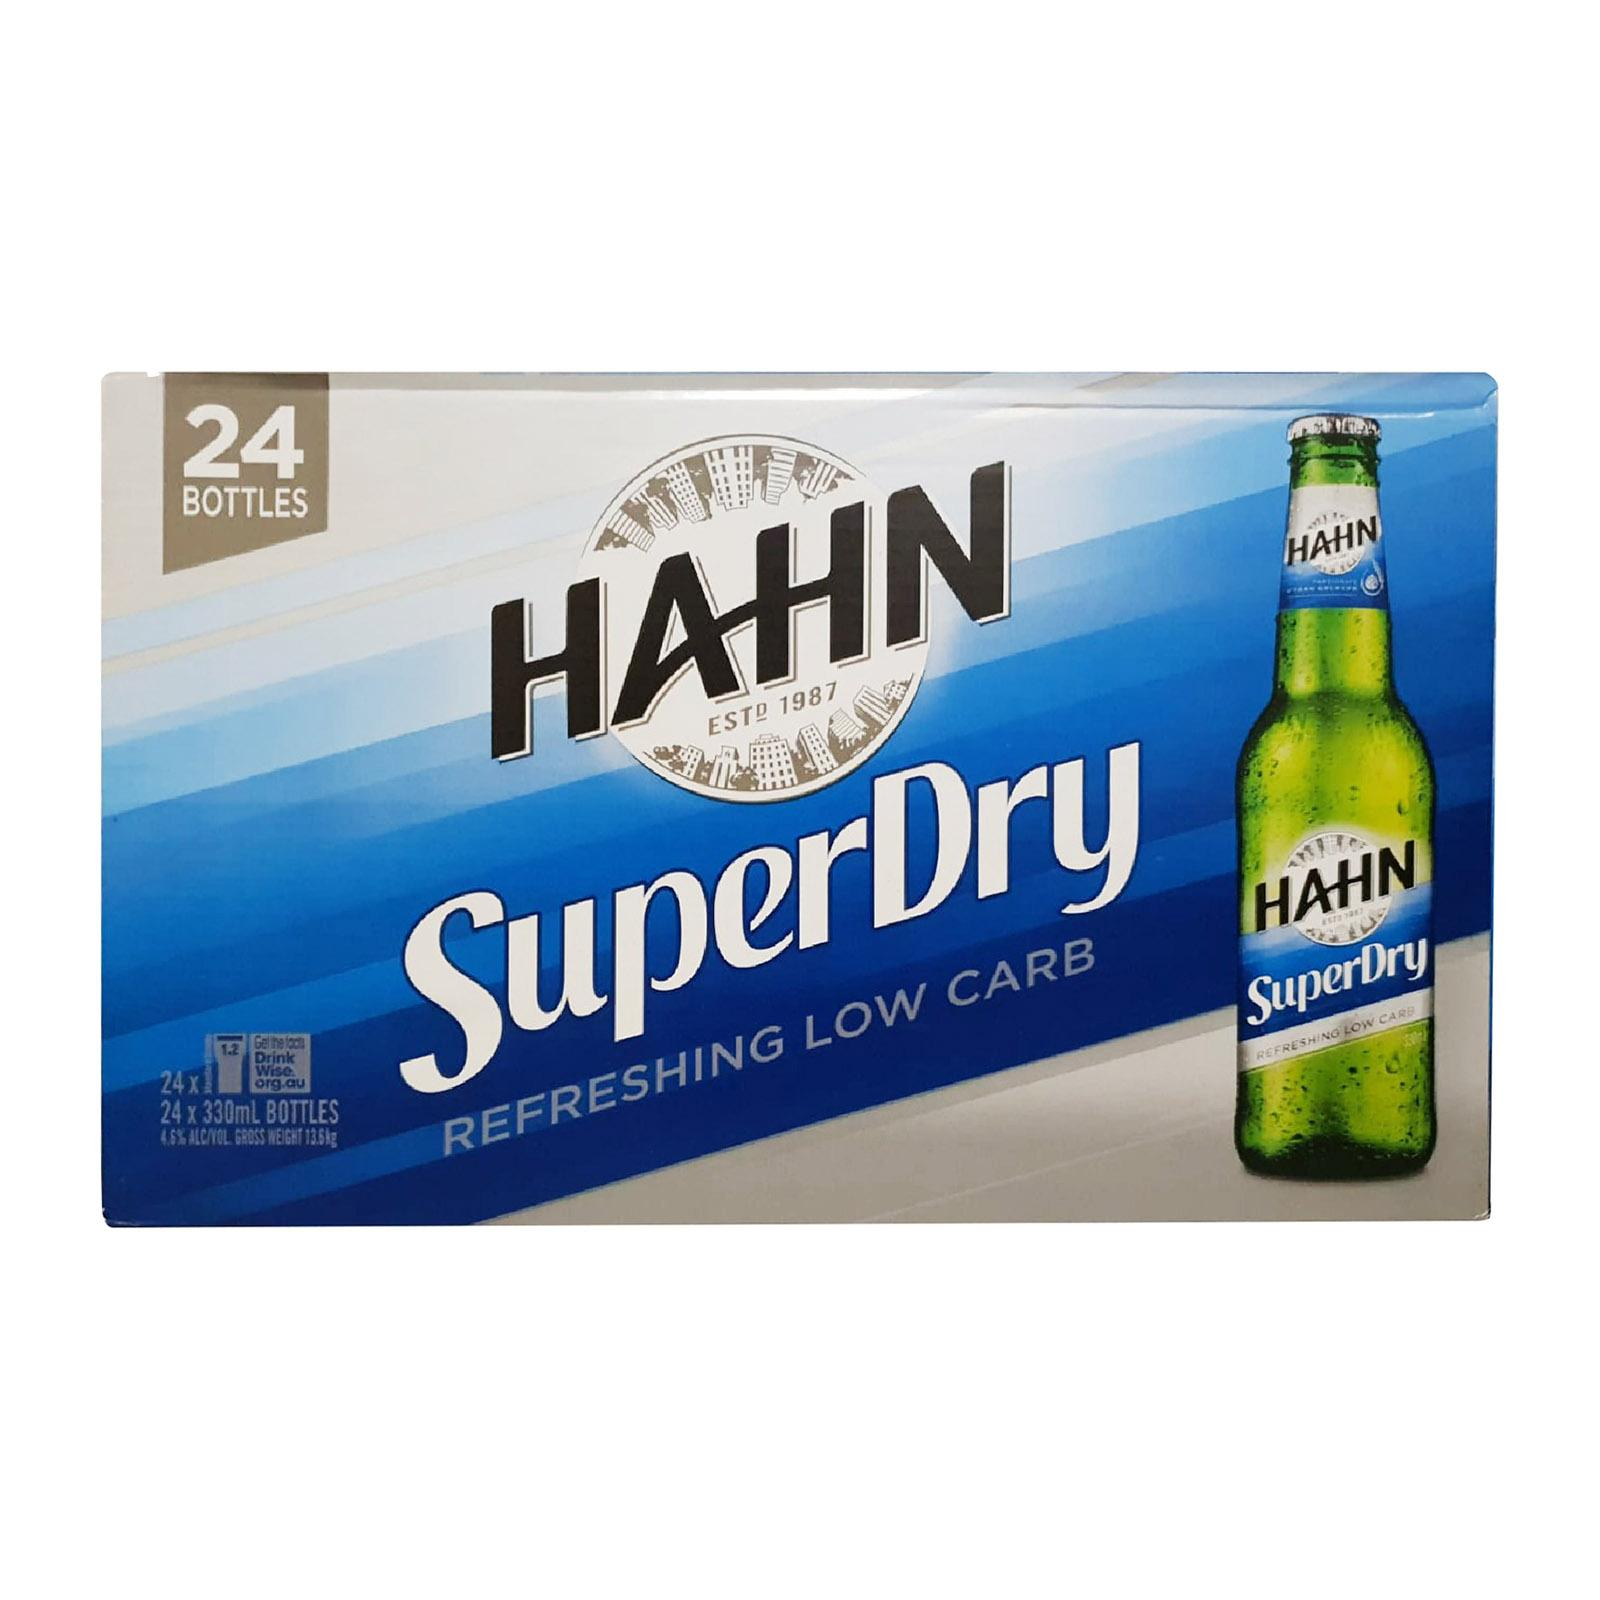 Hahn SuperDry (Low Carb) 4 x 6s x 330ml Bottle